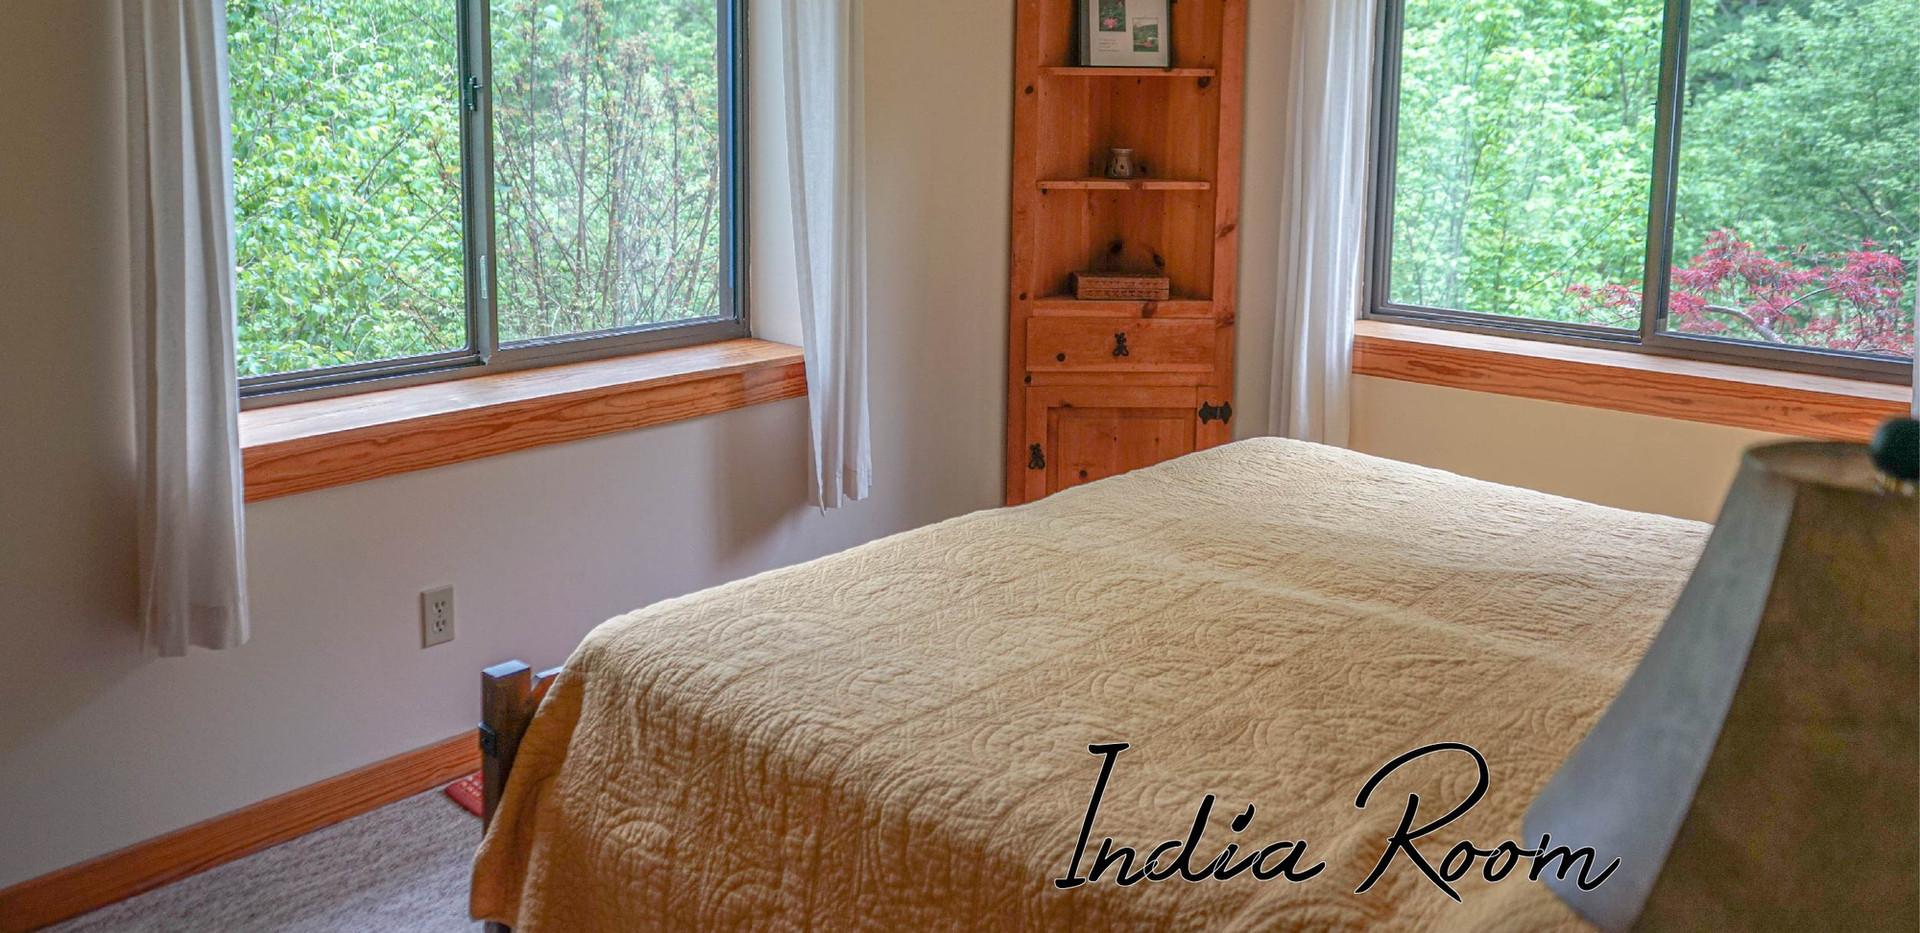 Bedroom 9 - India Room.jpg